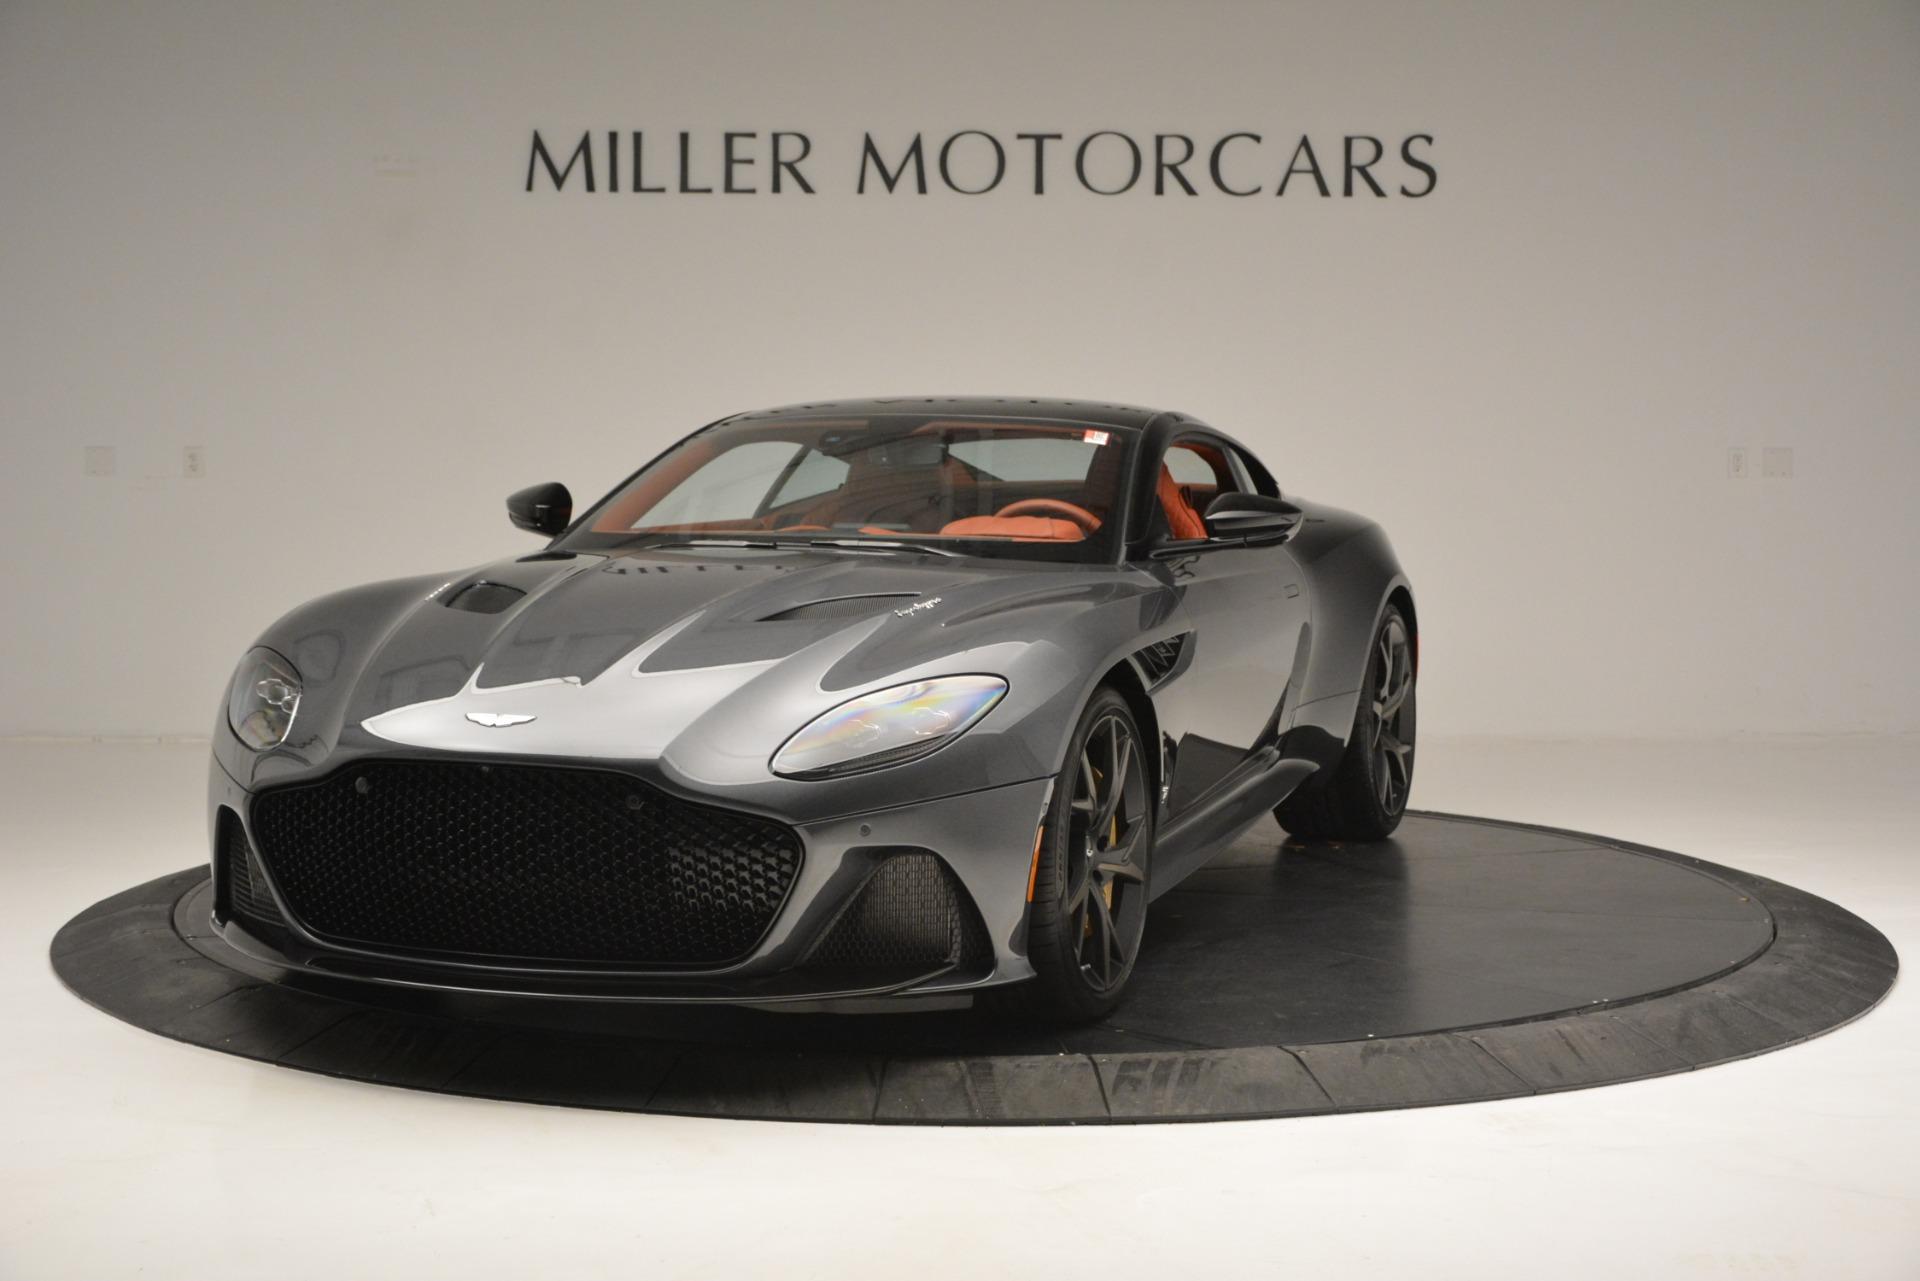 New 2019 Aston Martin DBS Superleggera For Sale In Greenwich, CT. Alfa Romeo of Greenwich, A1336 2827_p2